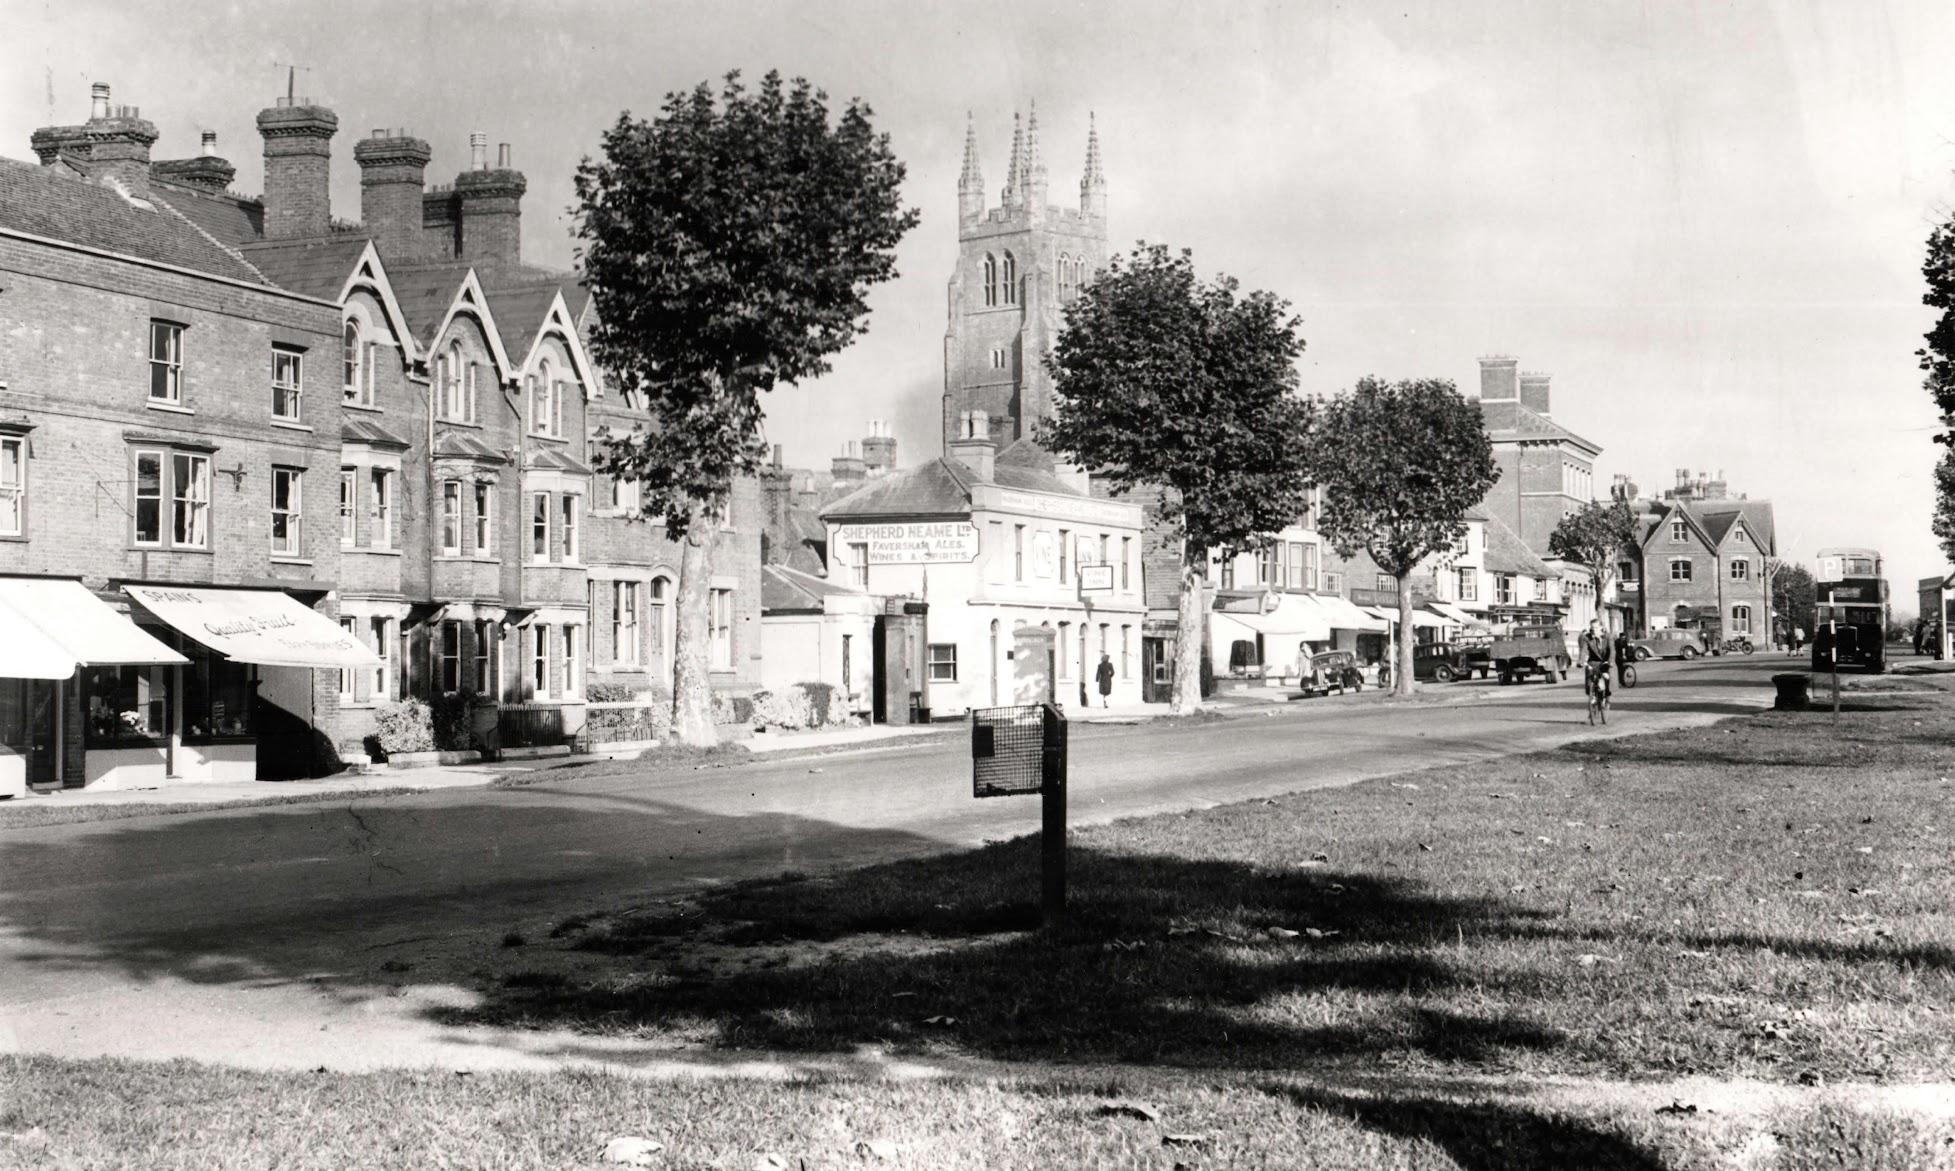 Water trough in the distance in Tenterden High Street in c.1960